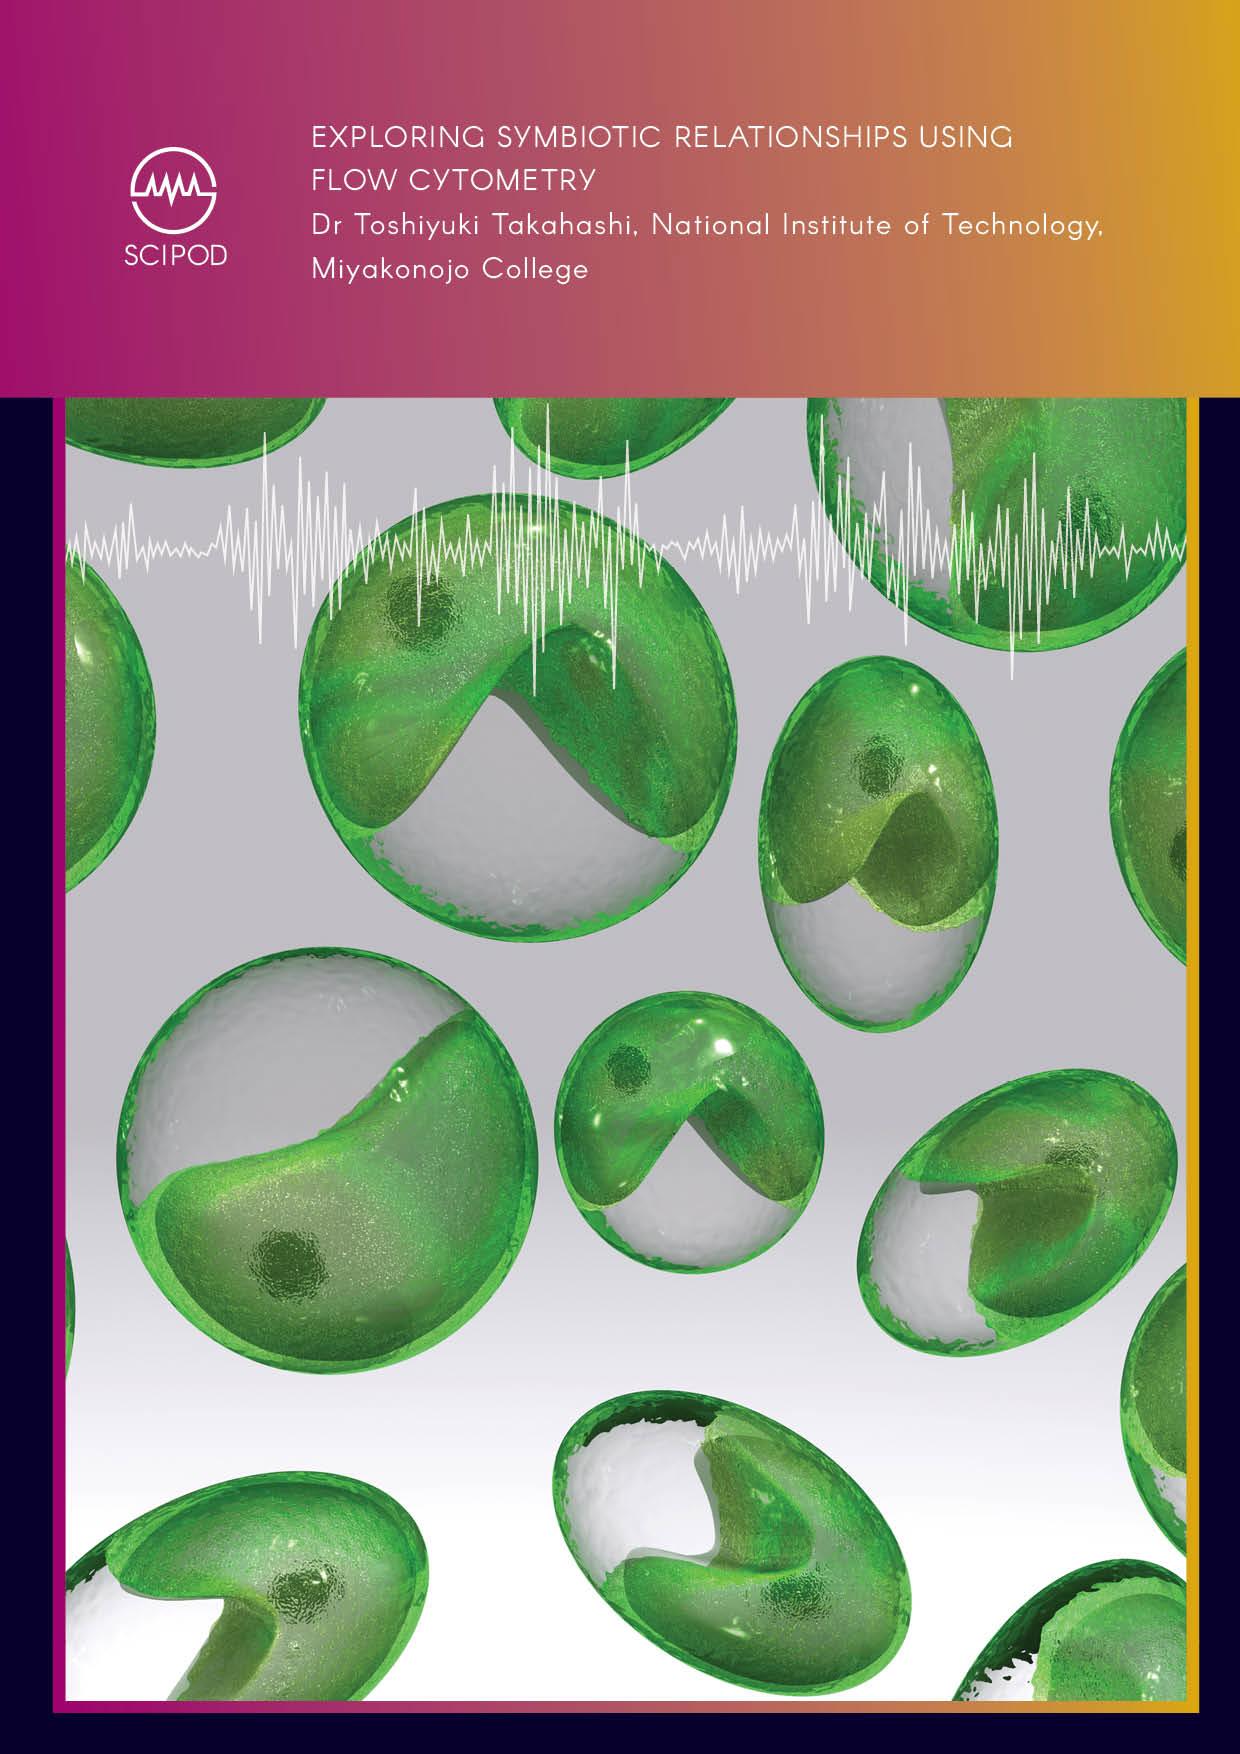 Exploring Symbiotic Relationships Using Flow Cytometry – Dr Toshiyuki Takahashi, National Institute of Technology in Miyazaki, Japan